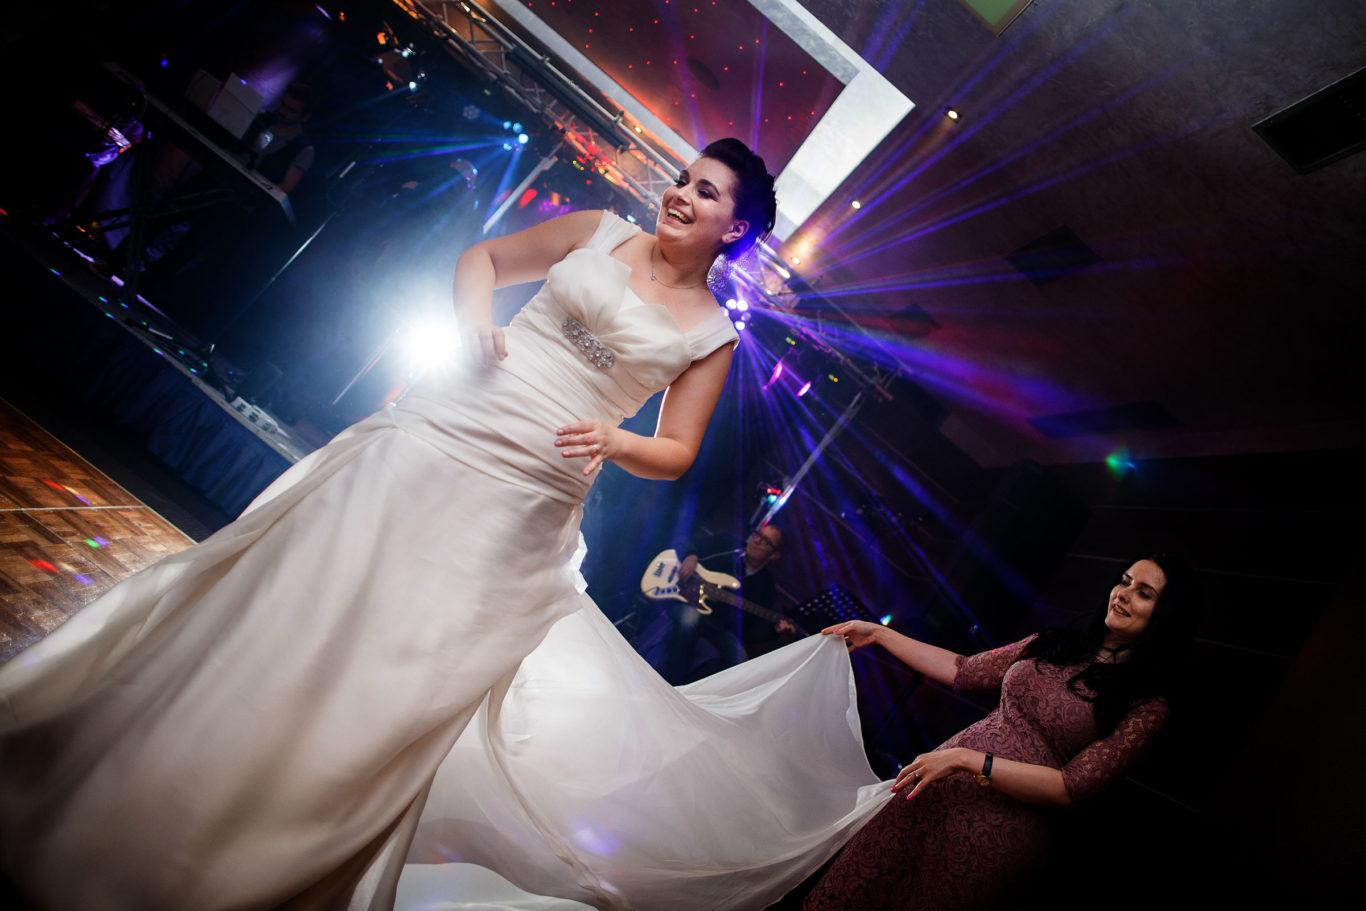 0617-Fotografie-nunta-Roxana-Costin-fotograf-Ciprian-Dumitrescu-DC1X1660